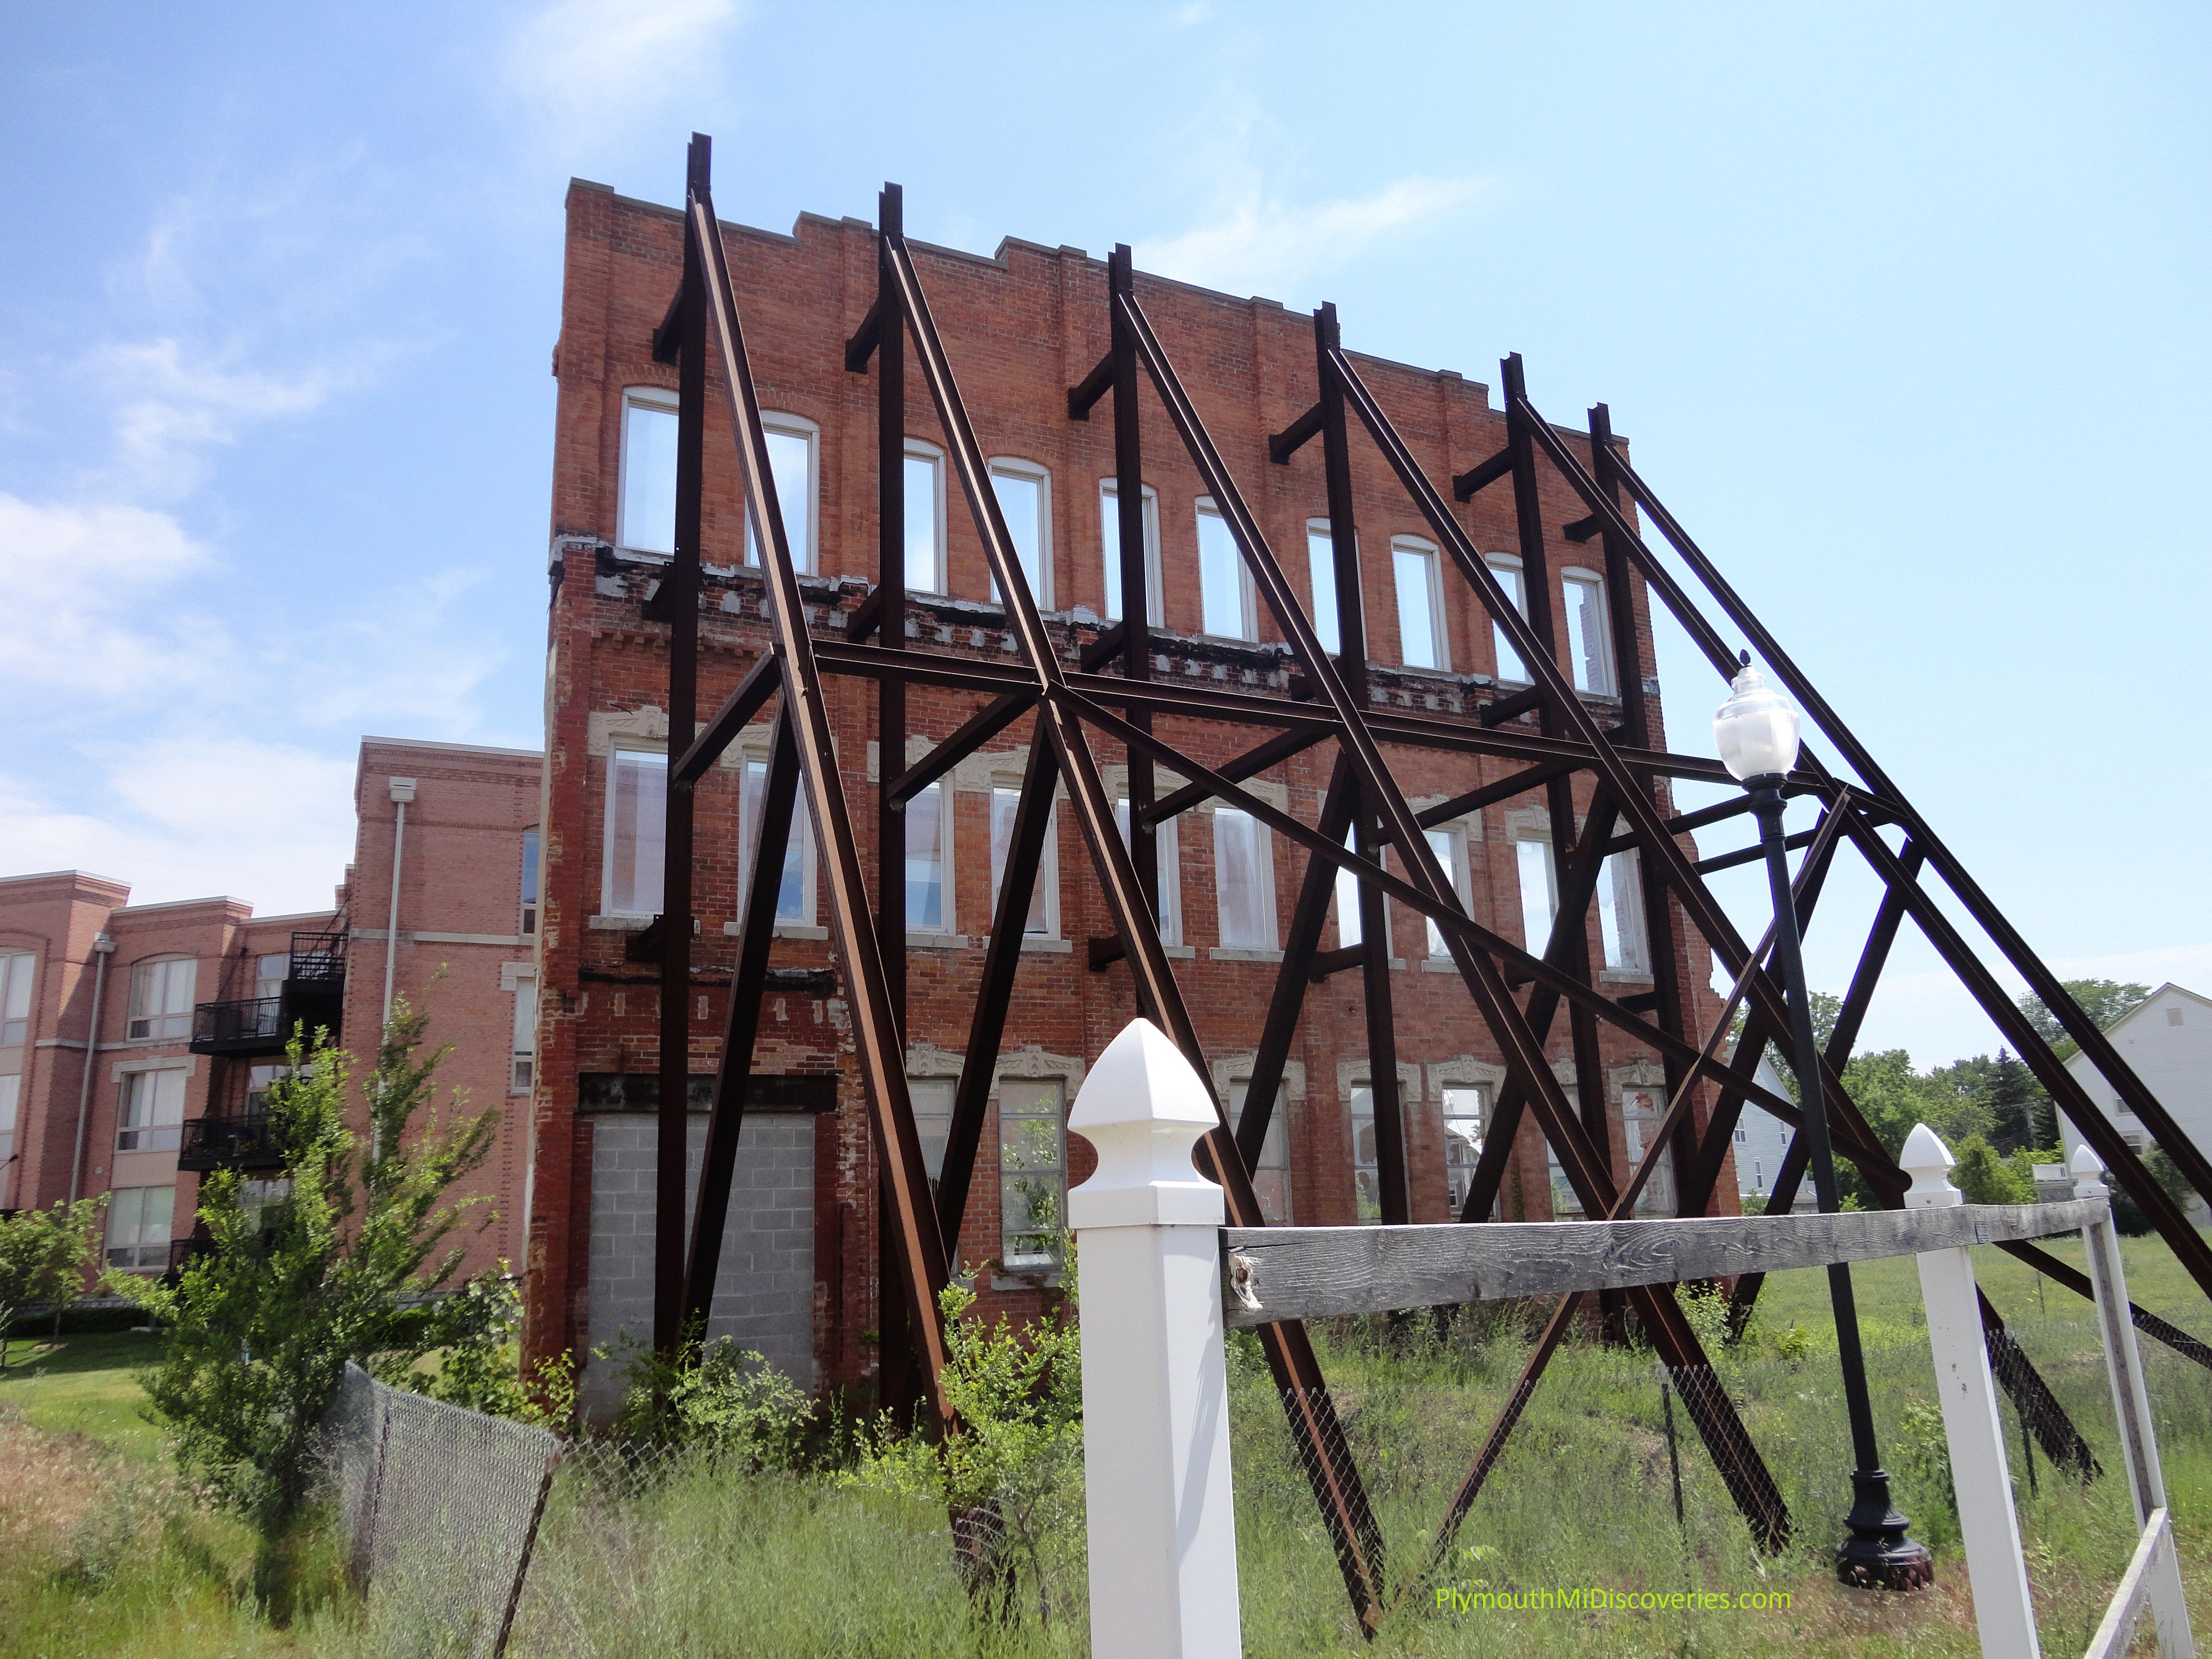 Daisy Air Rifle Factory on Union Street | PlymouthMiDiscoveries